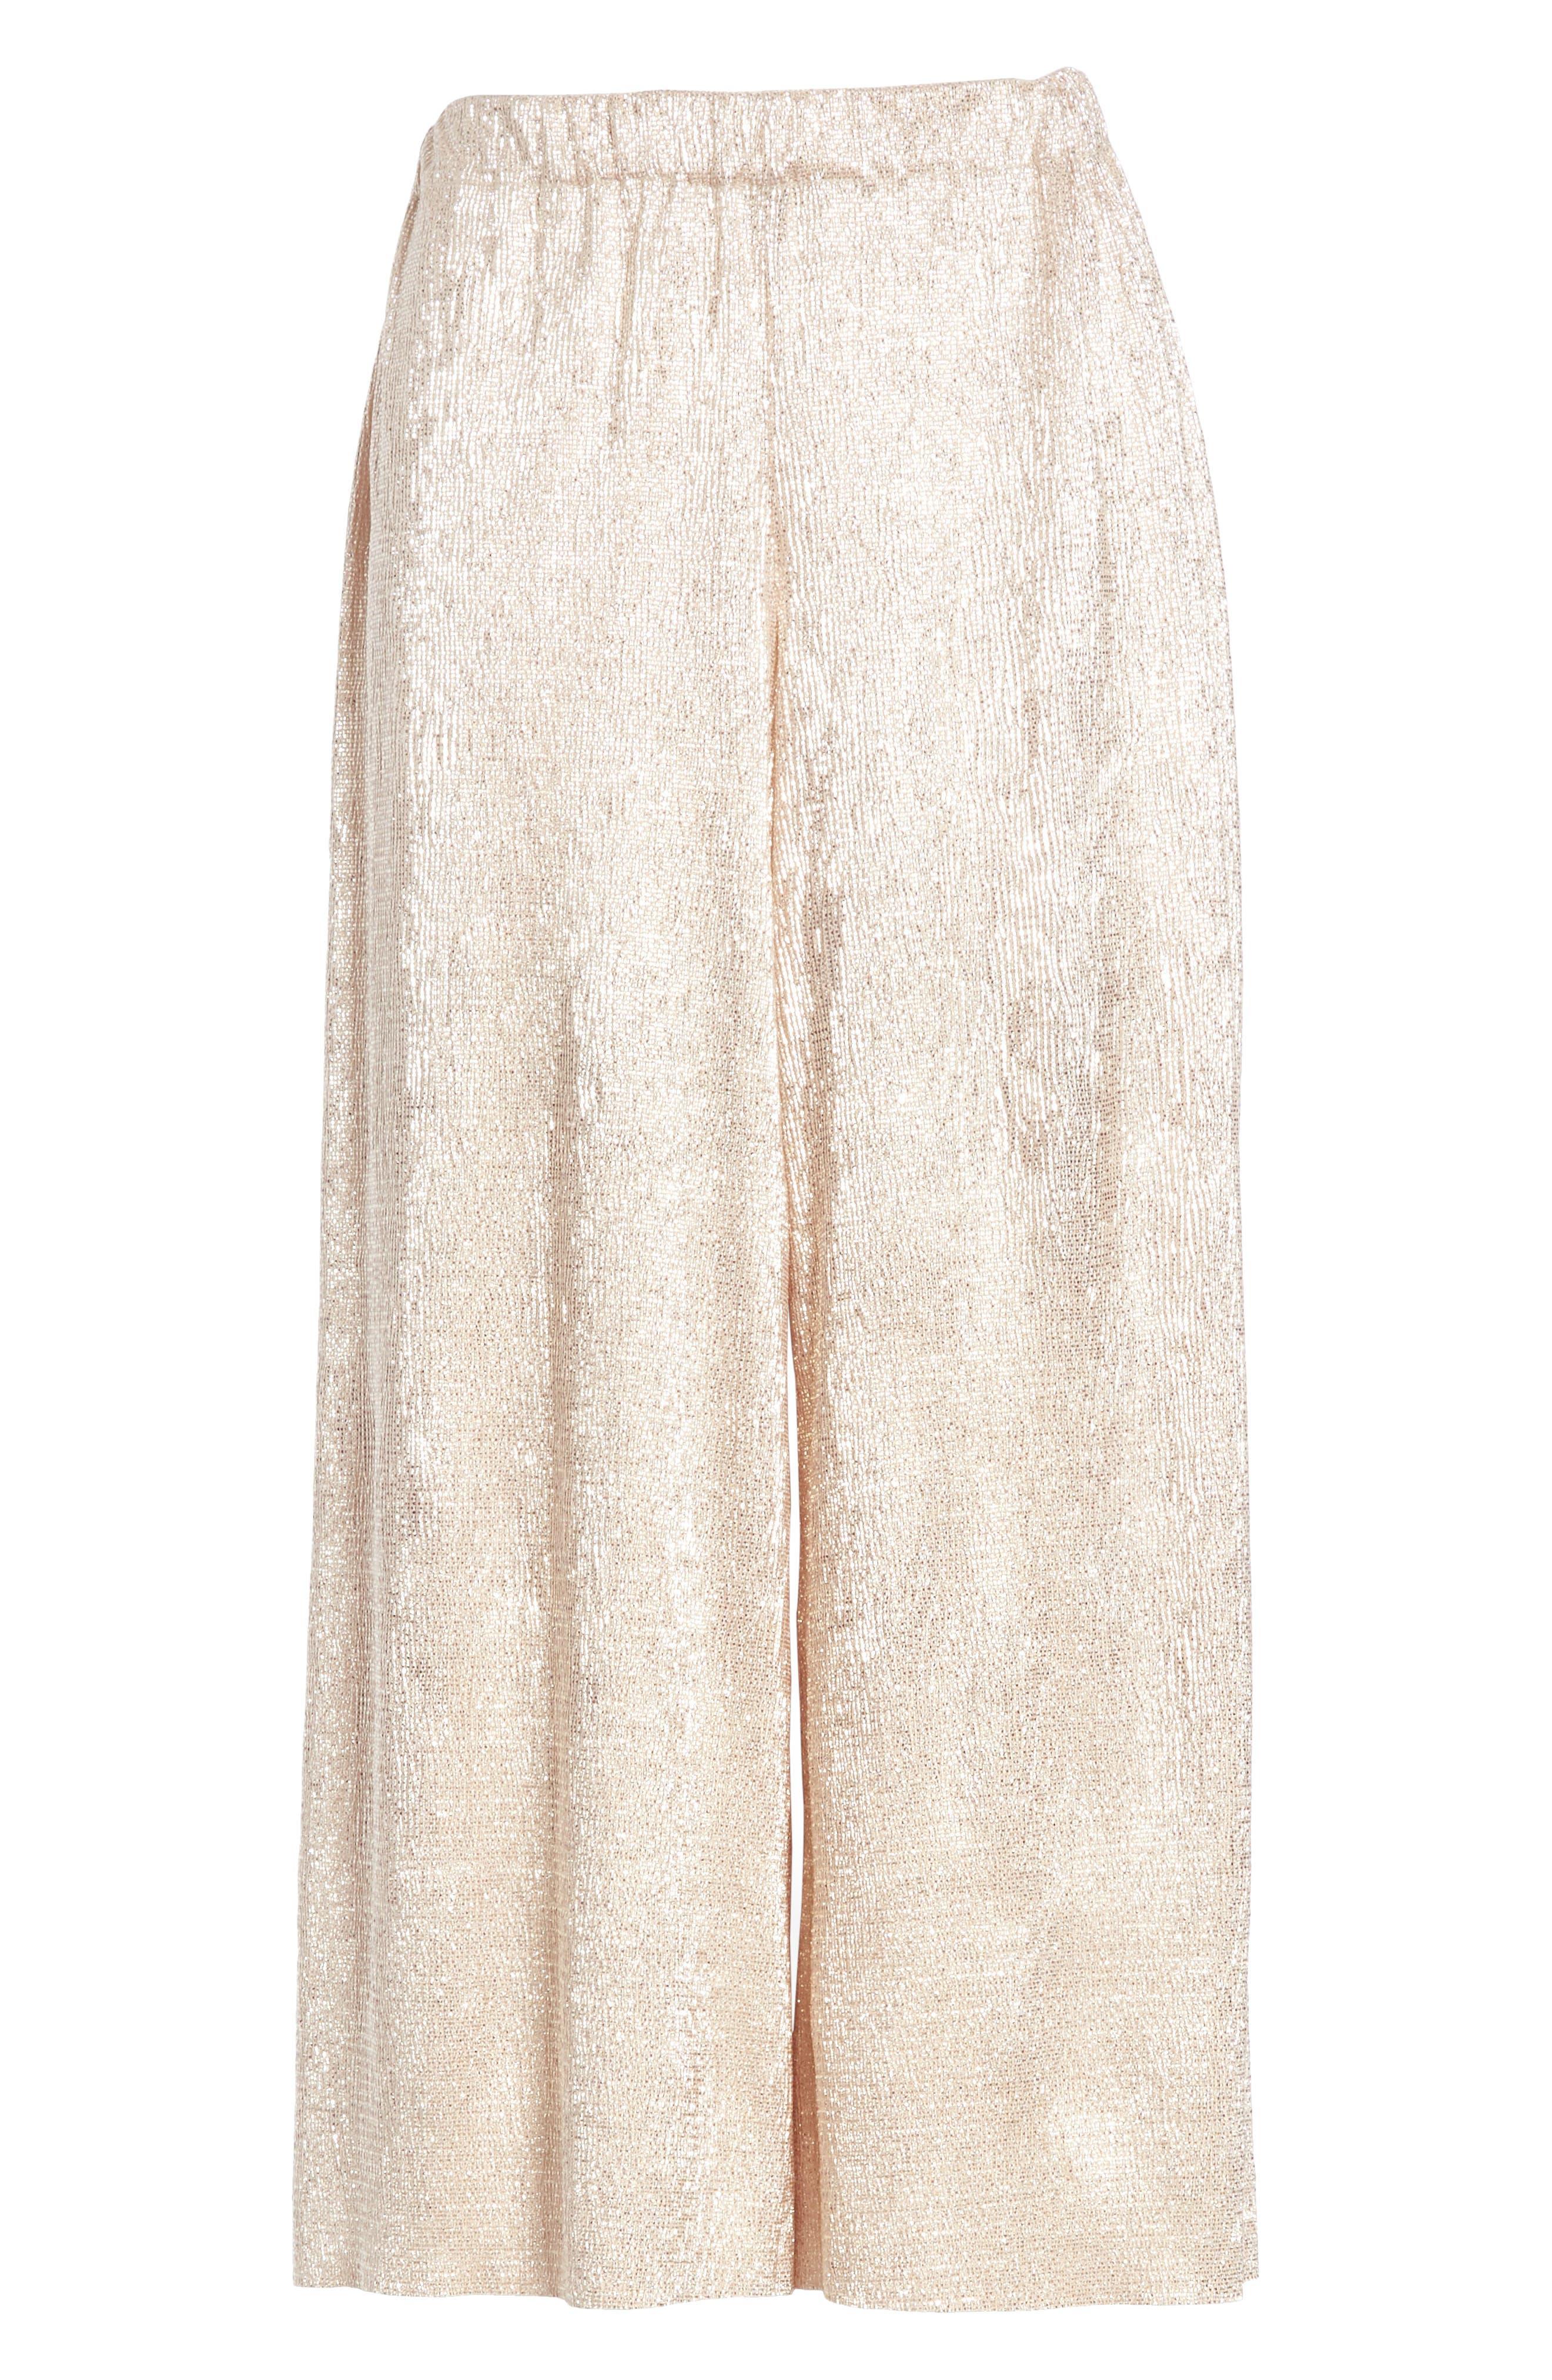 Elba Textured Crepe Wide Leg Pants,                             Alternate thumbnail 6, color,                             Blush